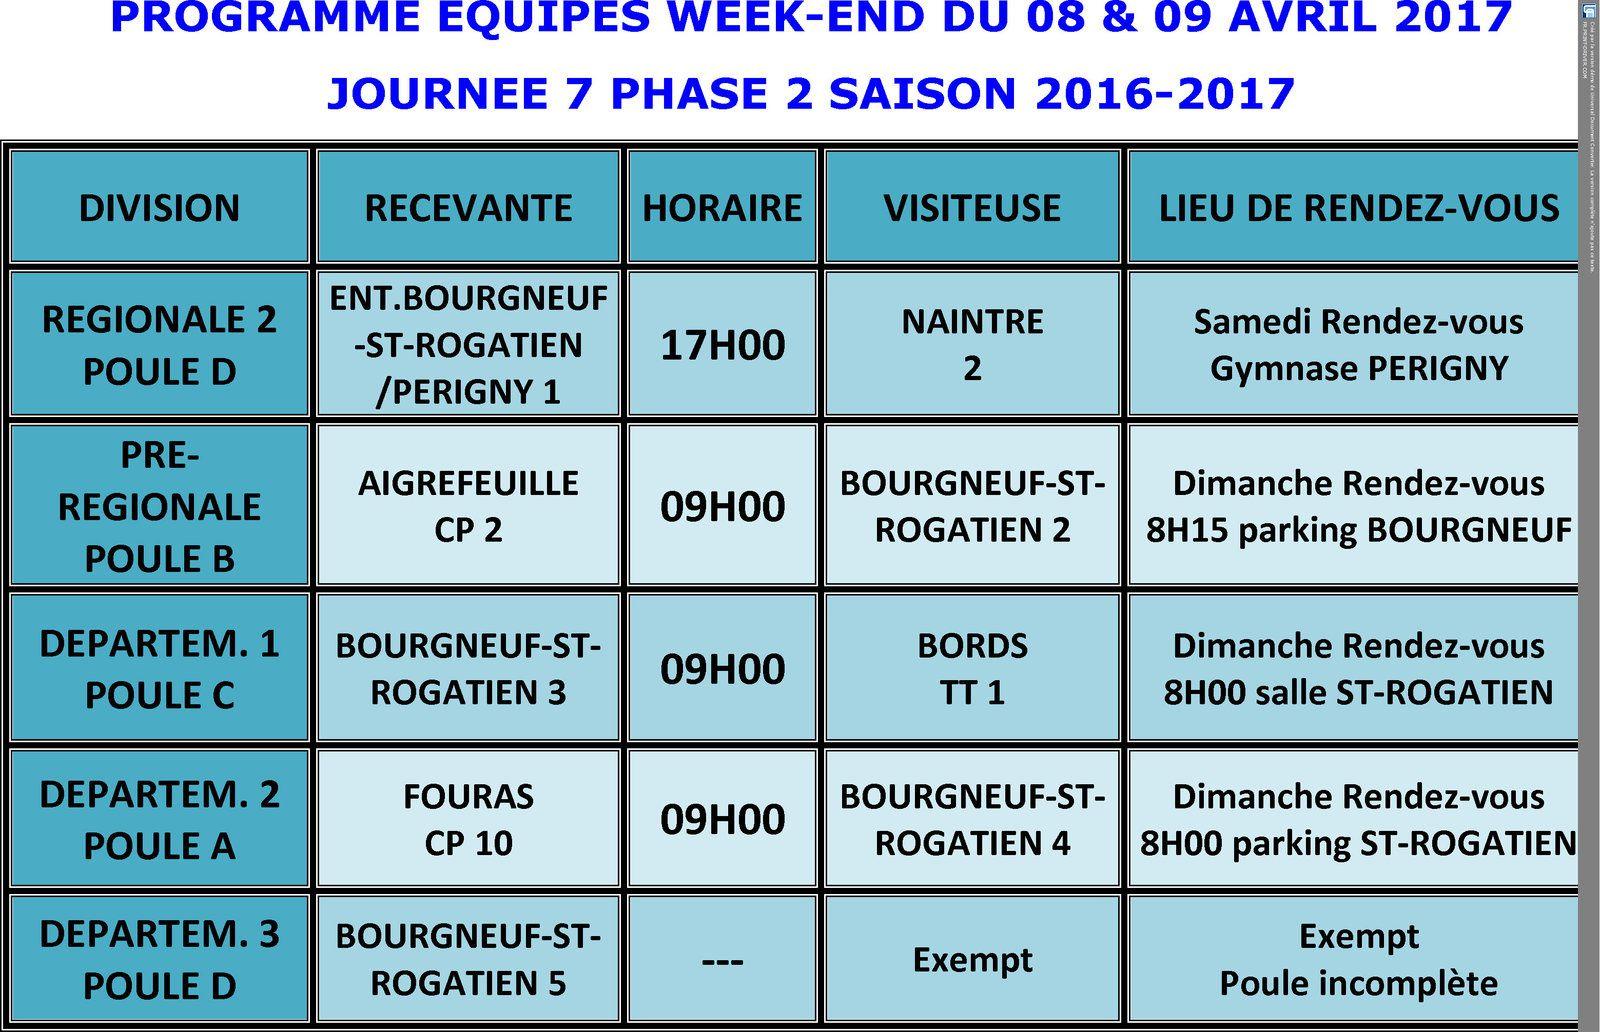 CHAMPIONNAT JOURNEE 7 PHASE 2 LES 08 &amp&#x3B; 09 AVRIL 2017